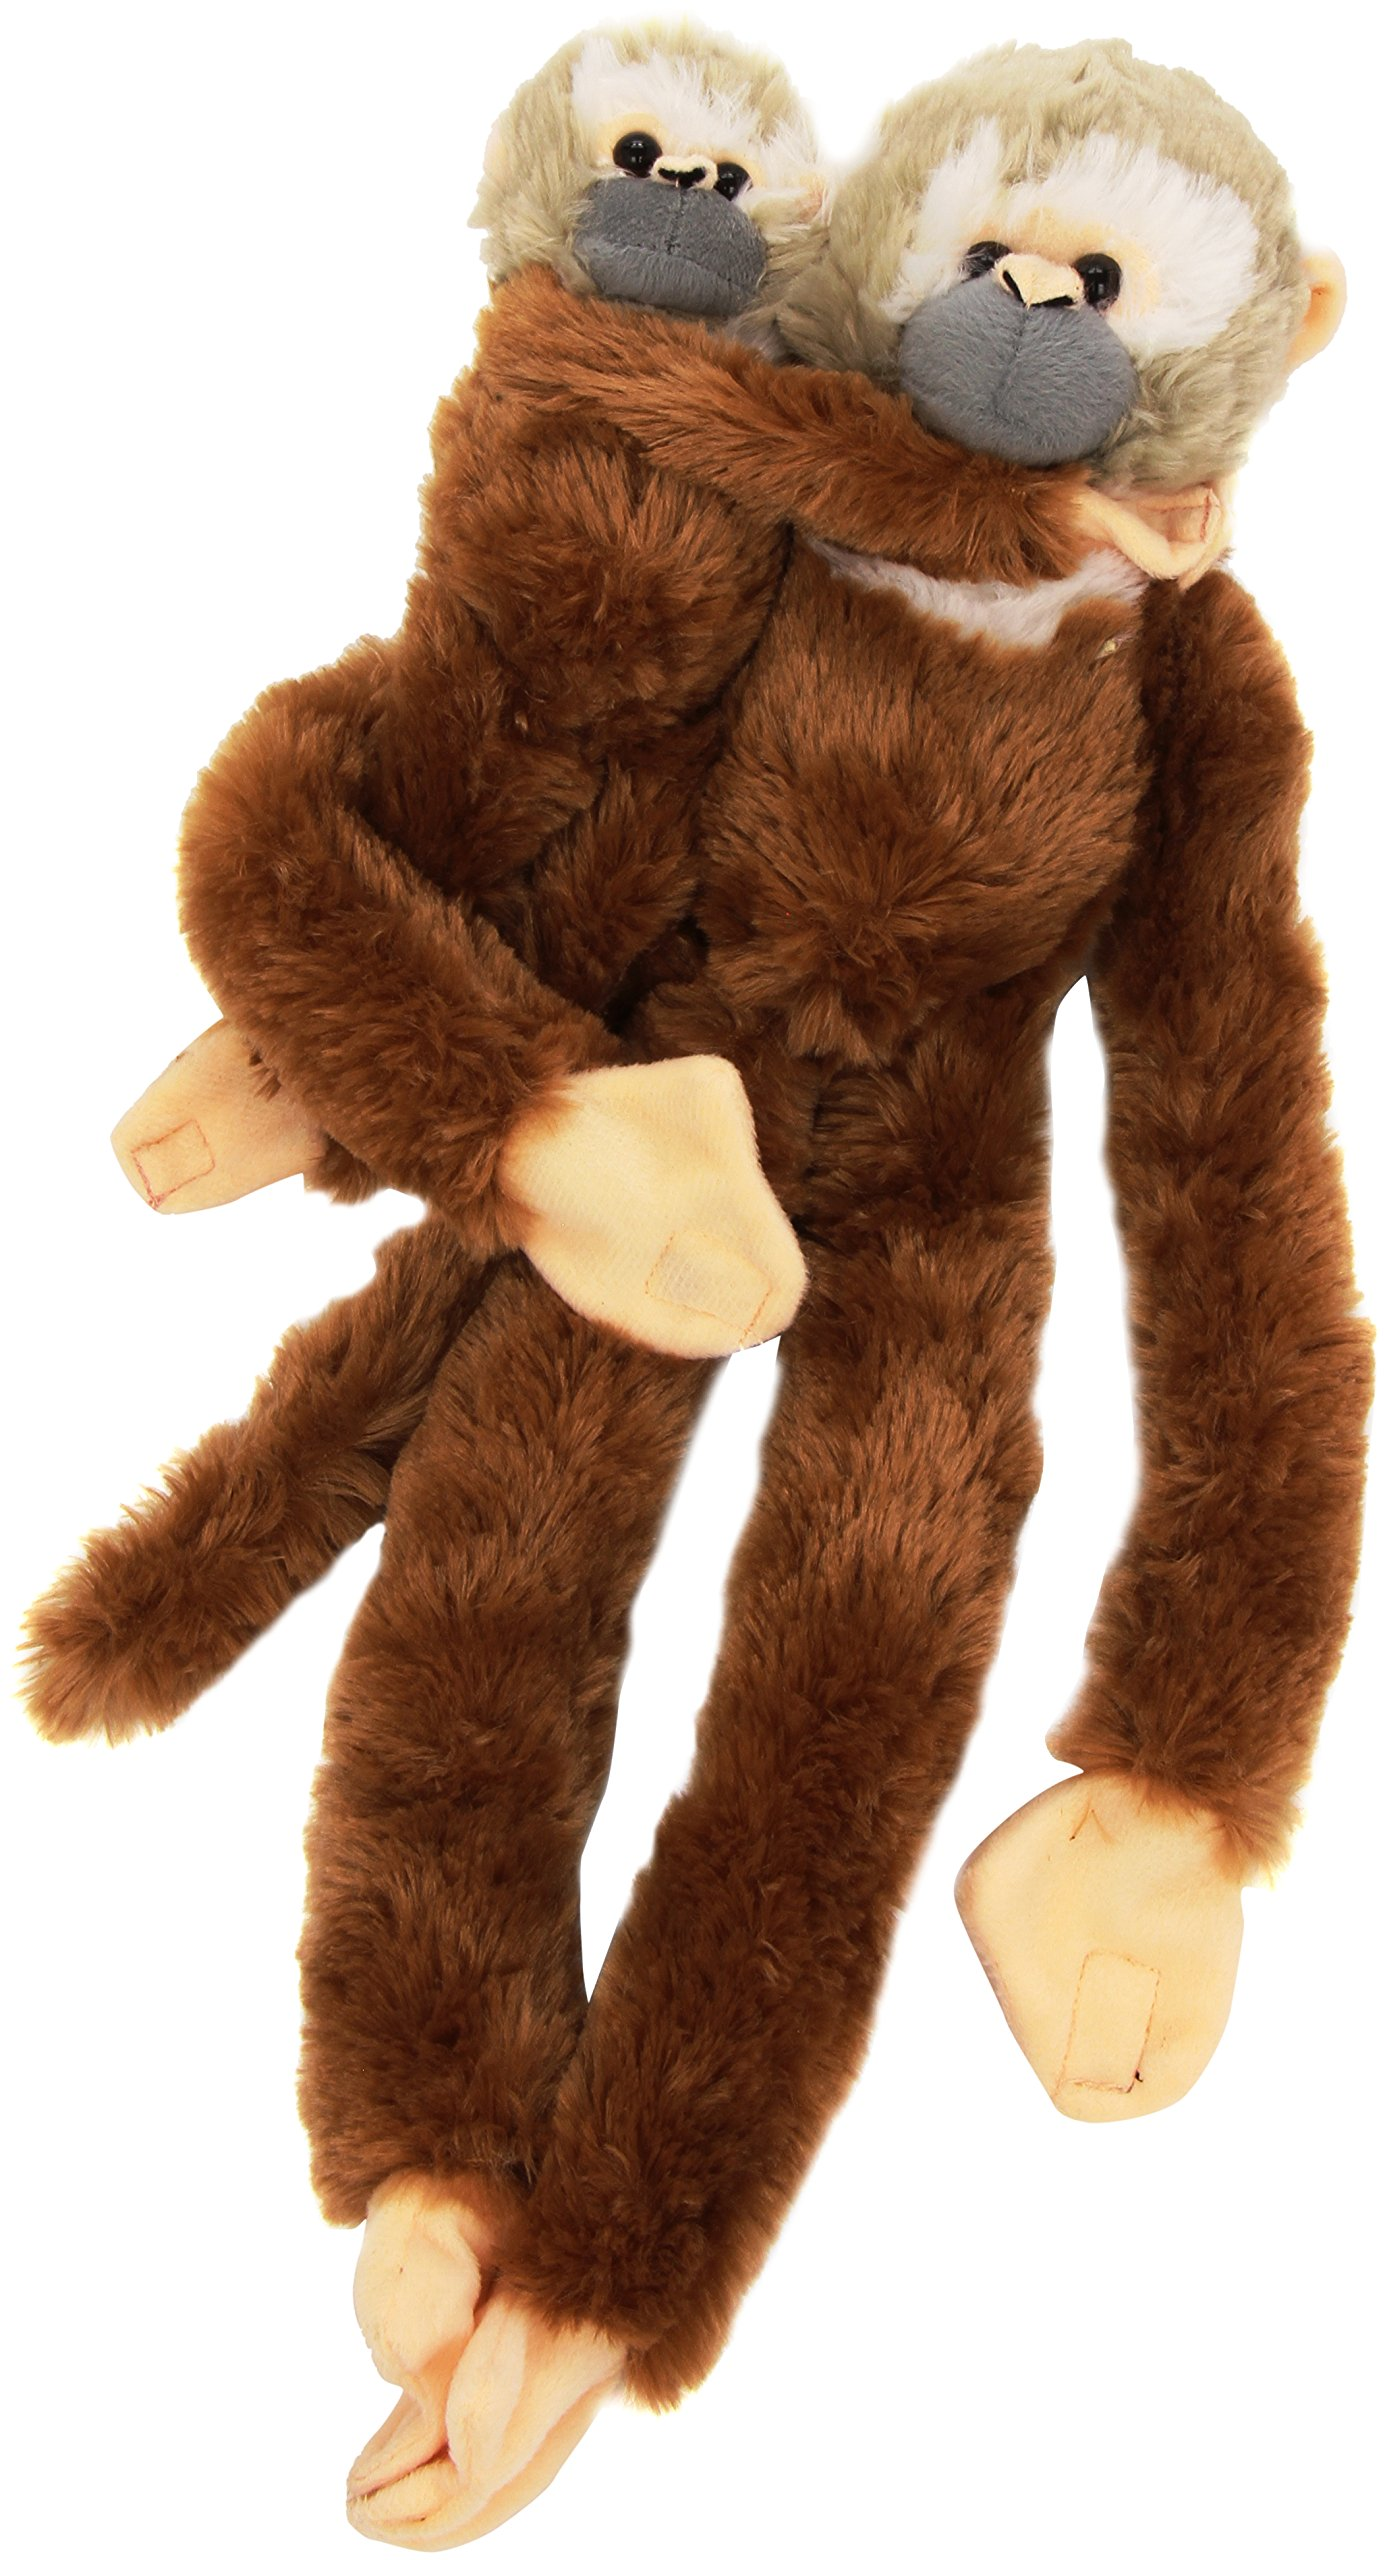 Cheap Squirrel Stuffed Animal Find Squirrel Stuffed Animal Deals On